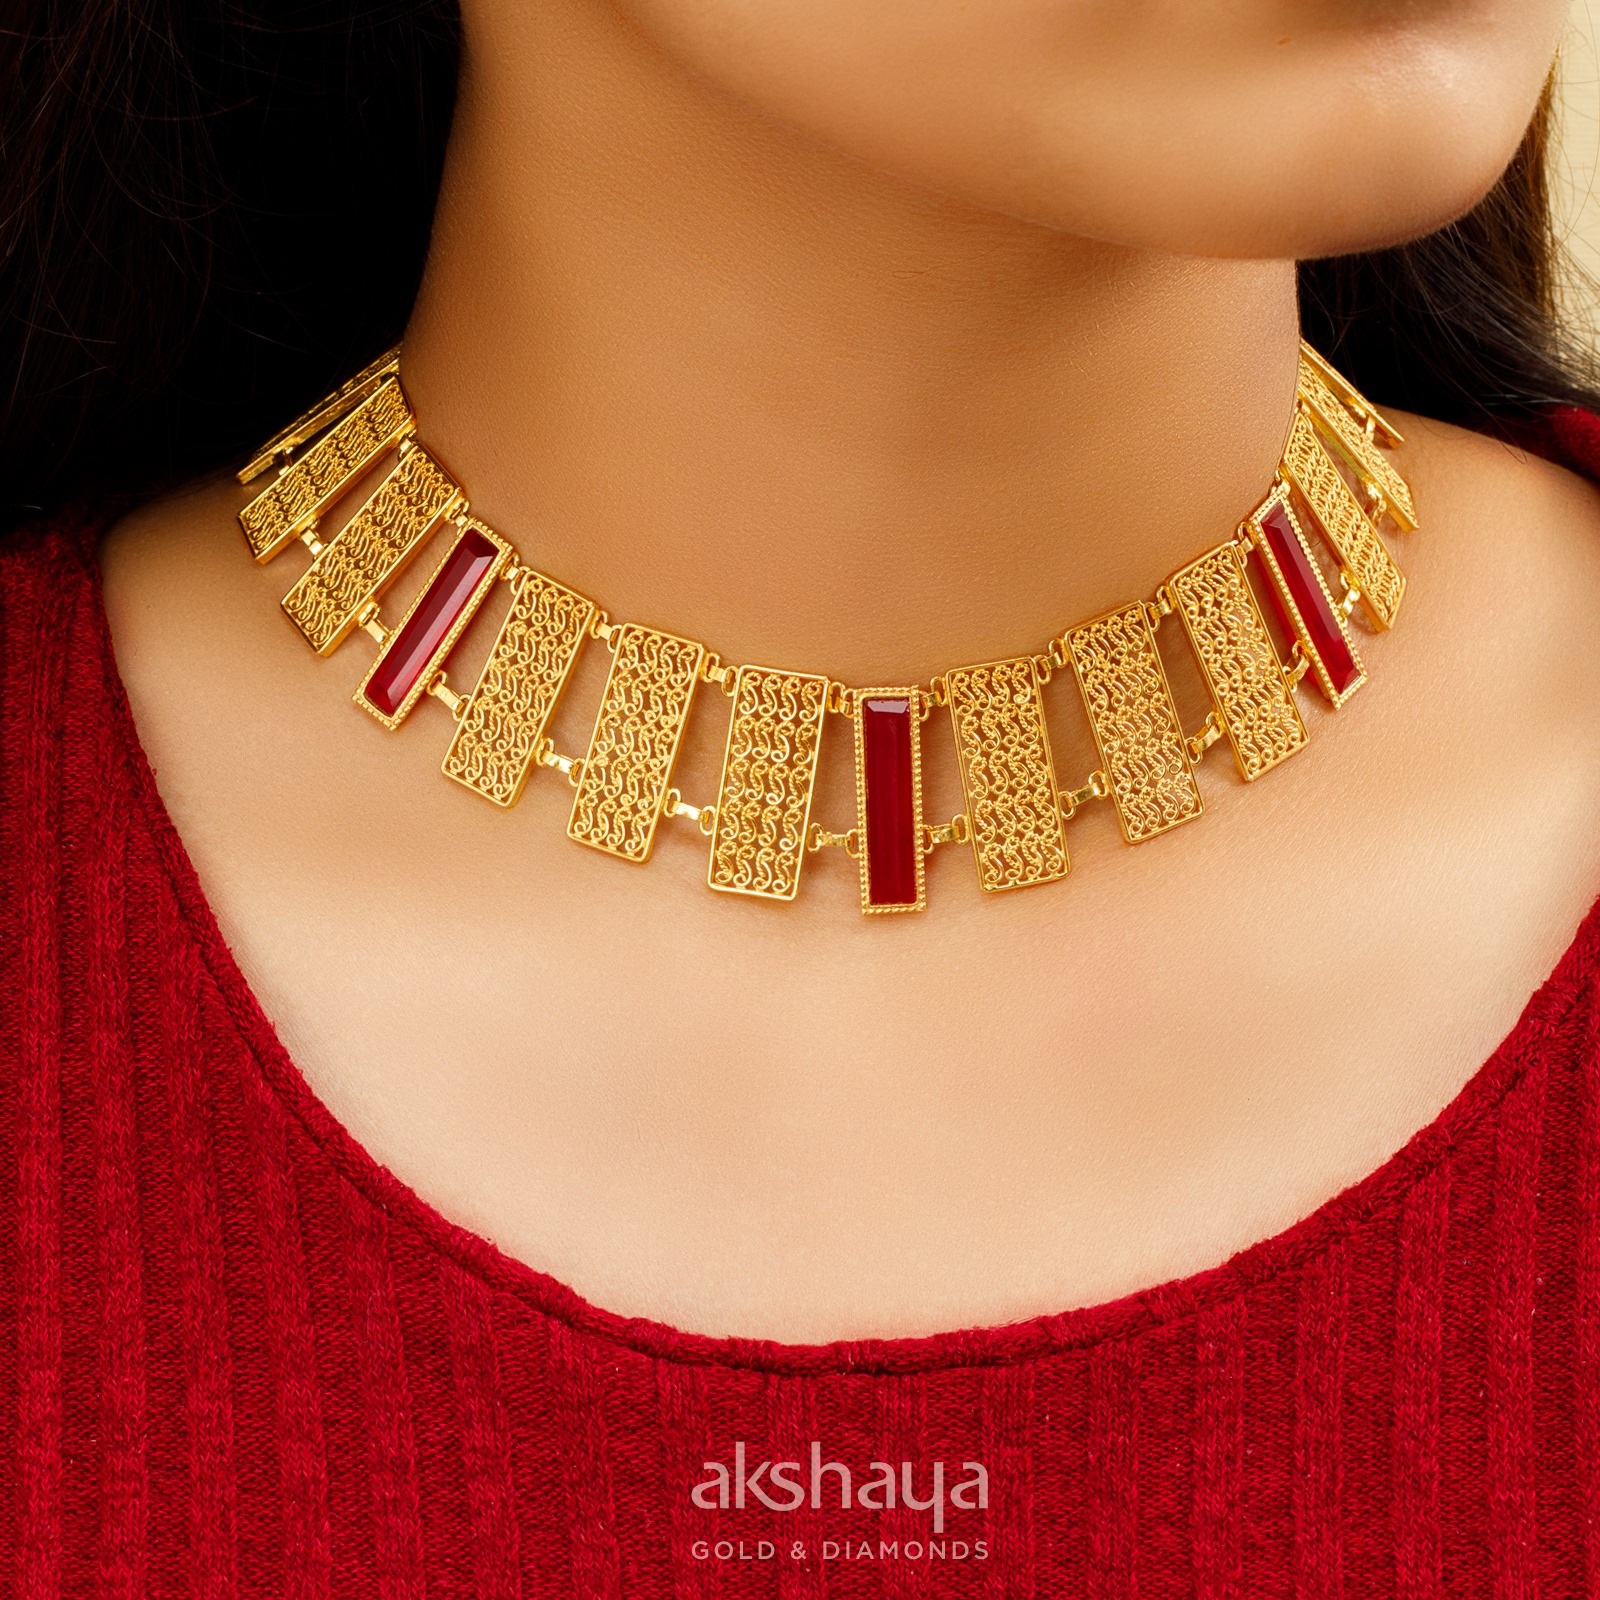 Akshaya Gold Necklace GL10258